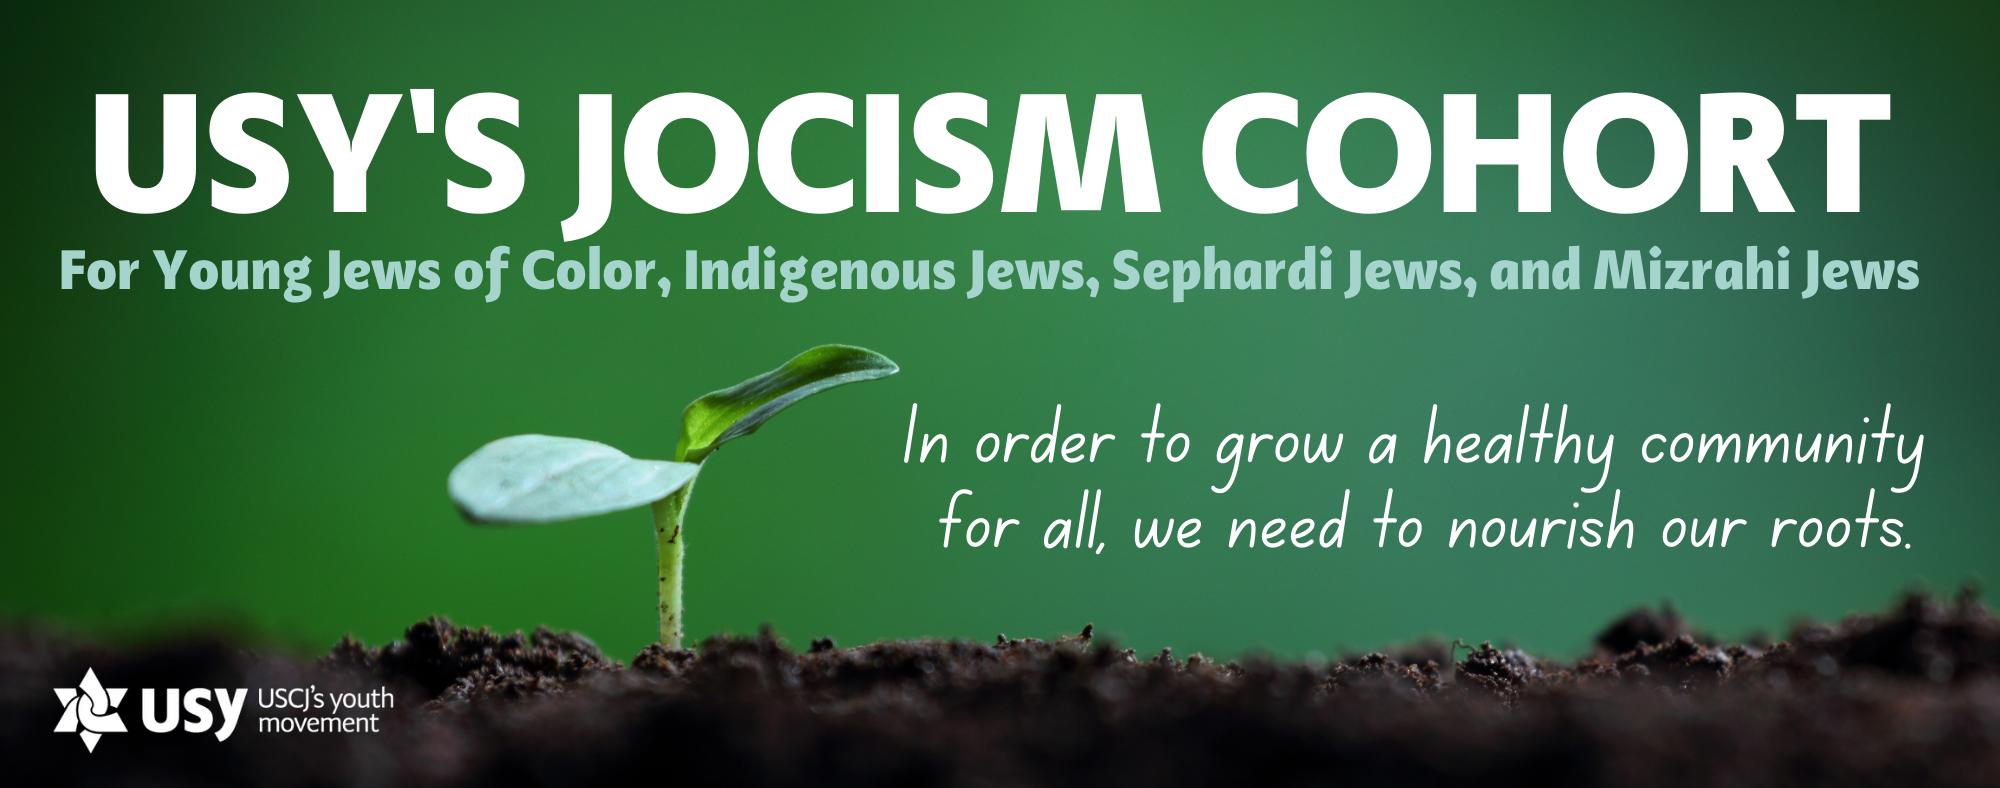 USY's JOCISM Cohort